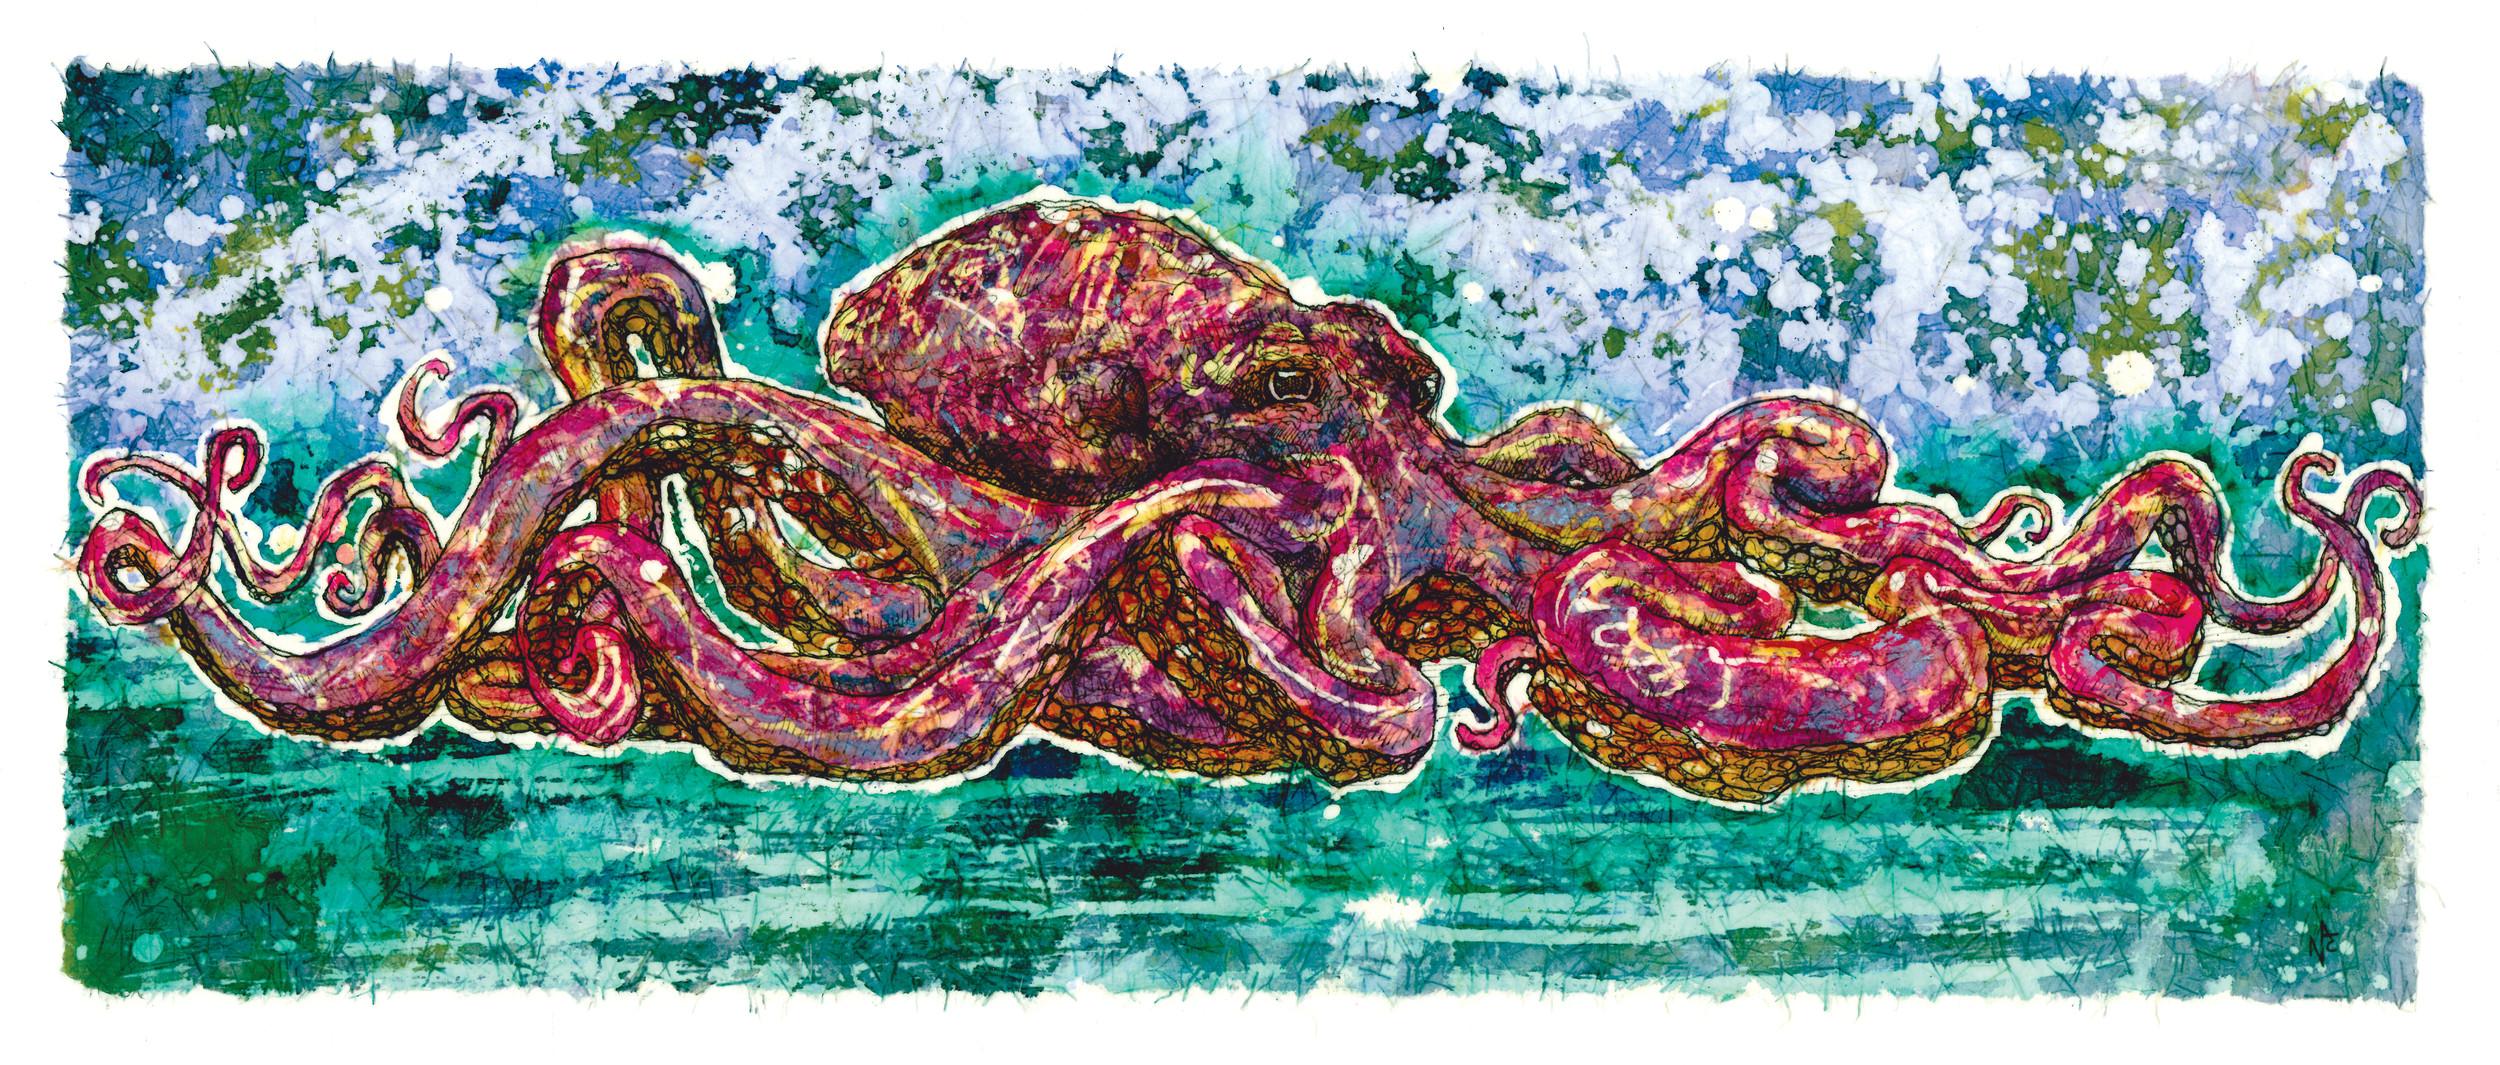 Octopus_Ursula.jpg